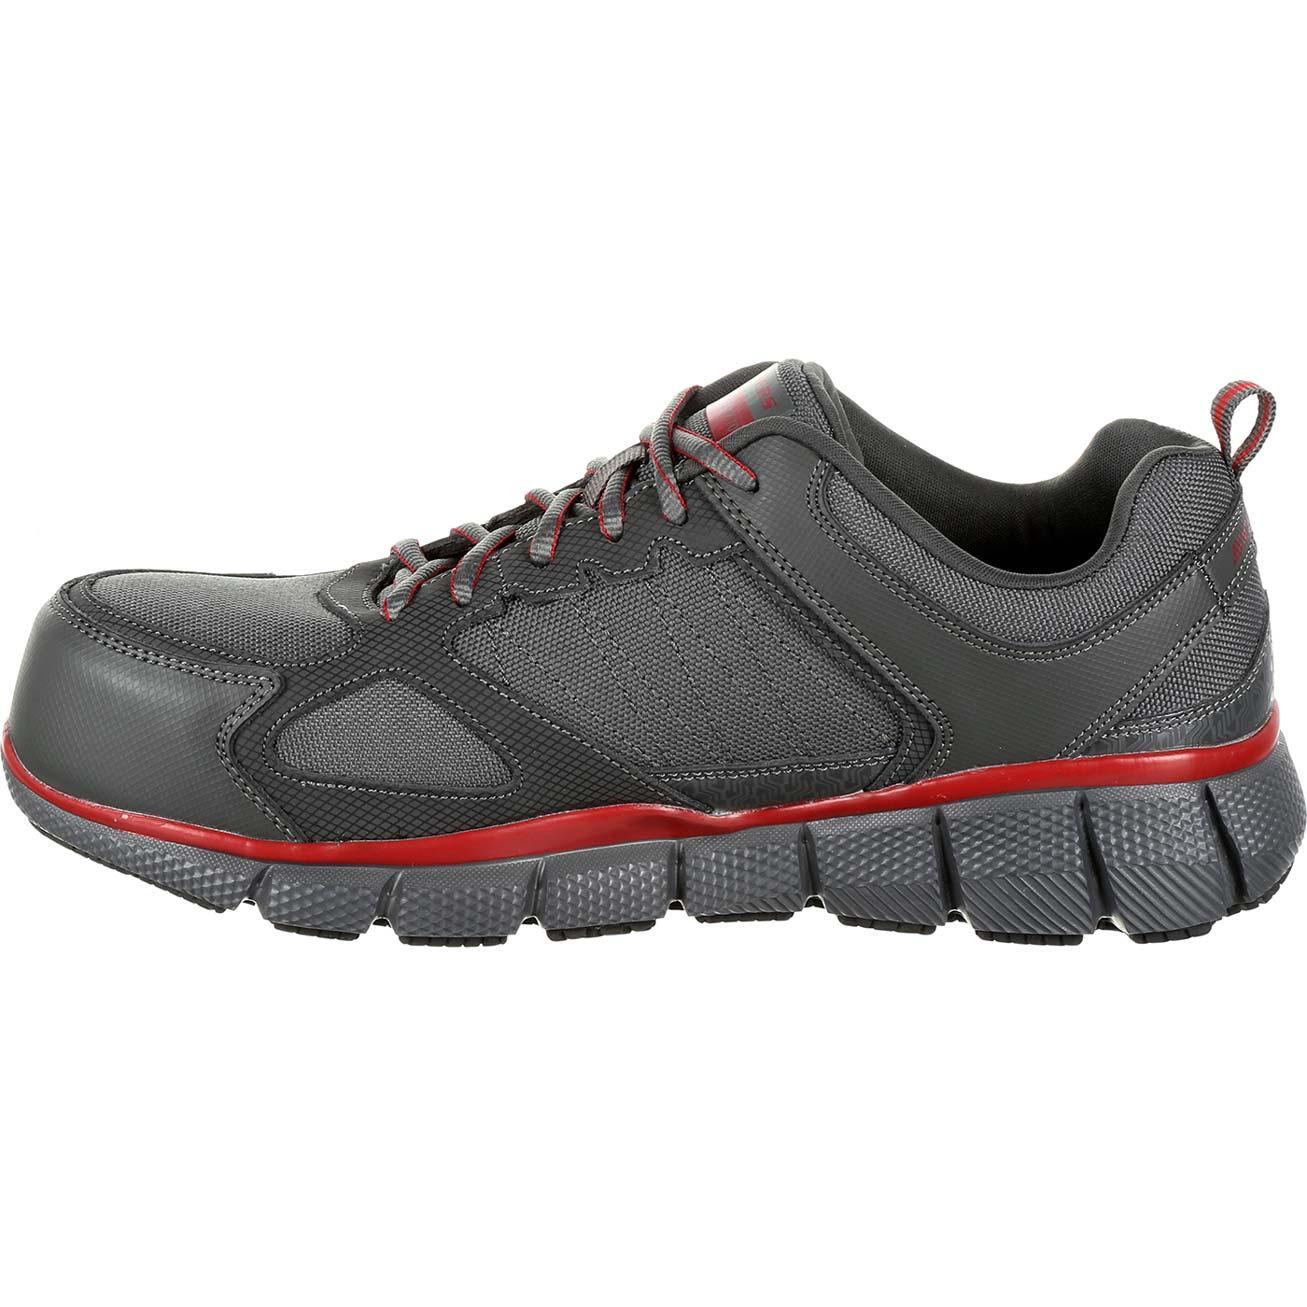 Loading zoom. SKECHERS Telfin Composite Toe Puncture-Resistant  Slip-Resistant Work Athletic Shoe ... f93f20a80fe4